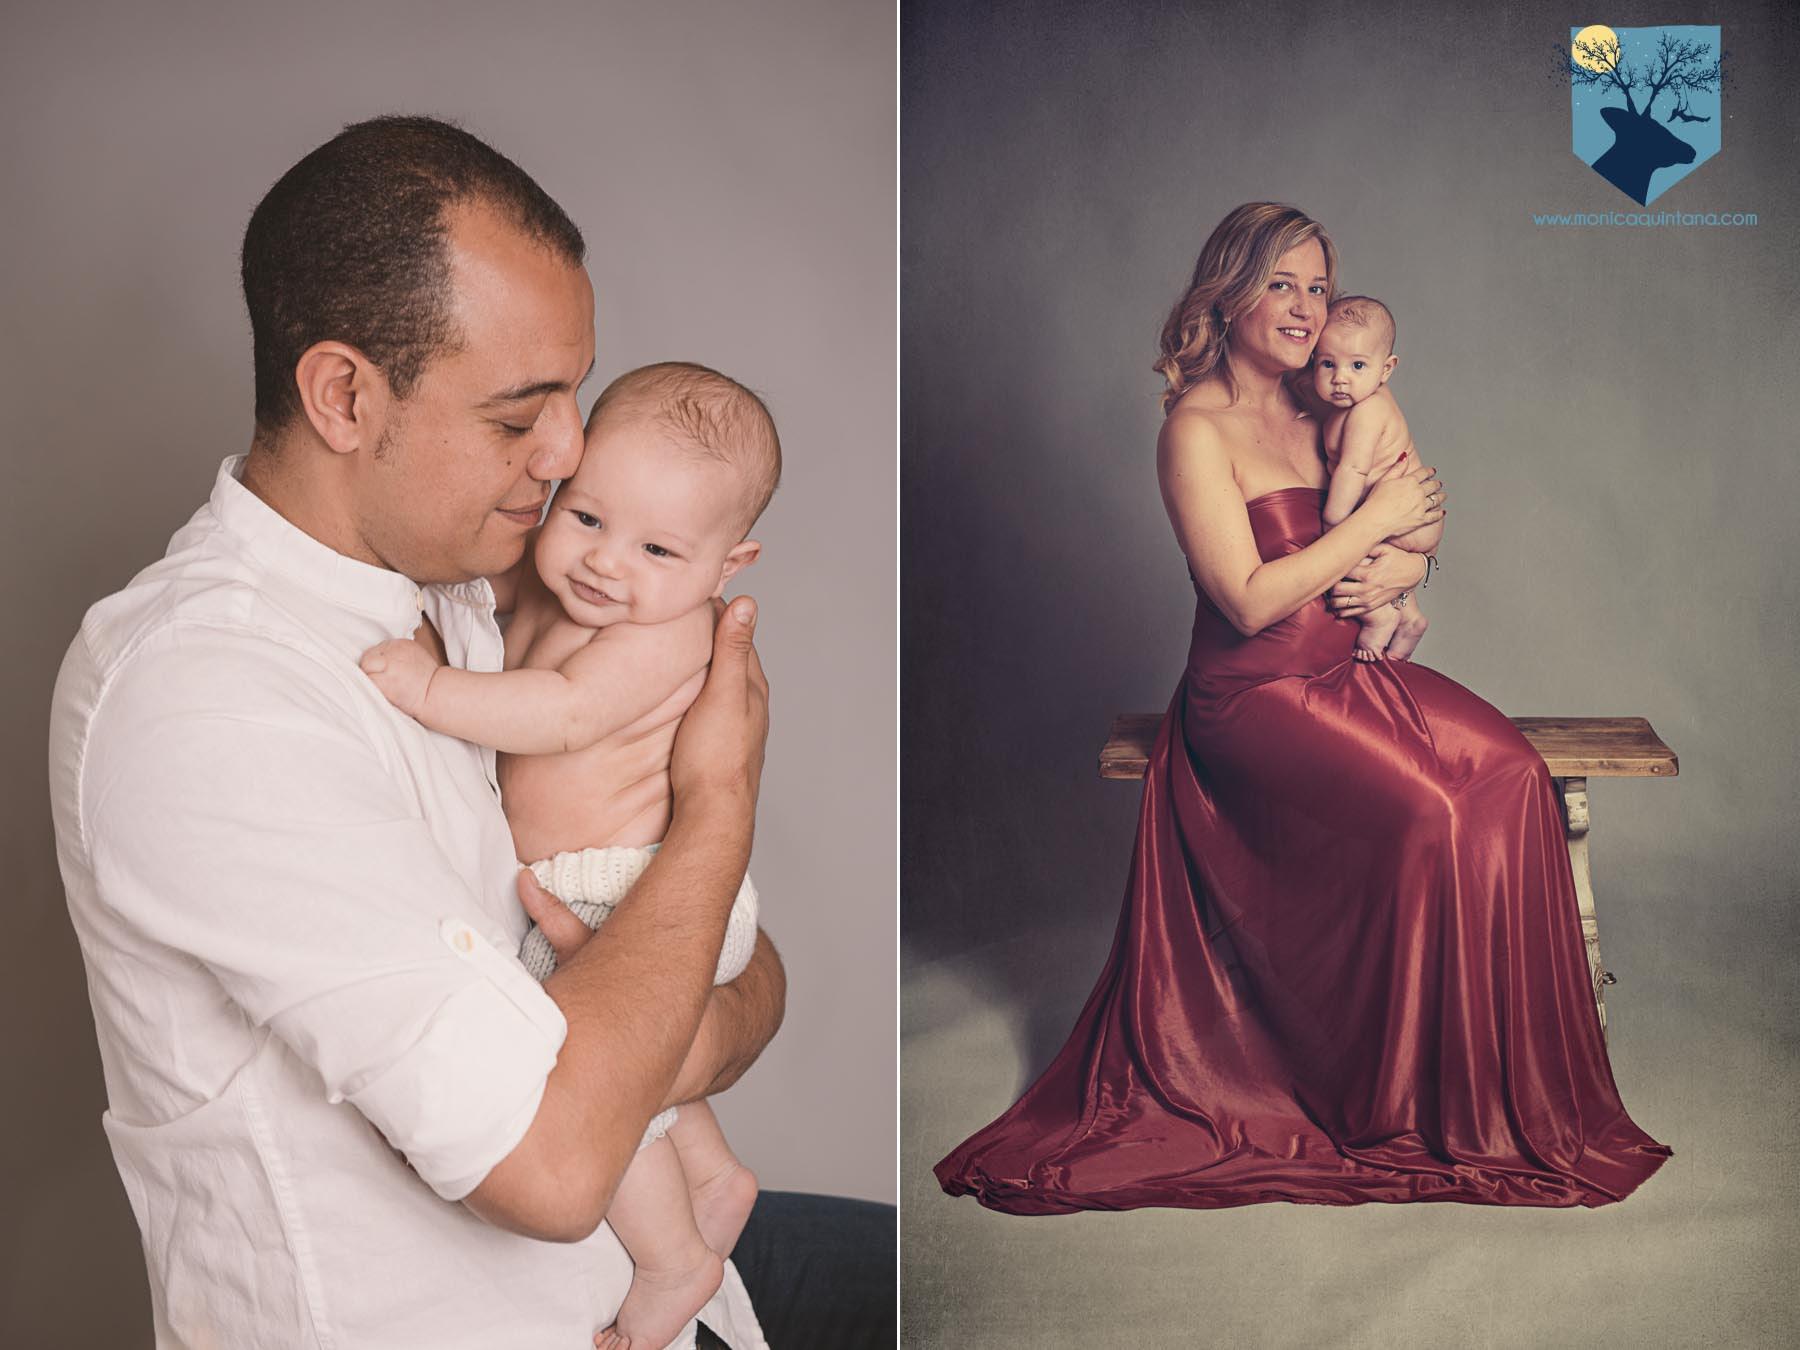 fotografia, fotos, girona, figueres, emporda, roses, besalu, olot, monica, quintana, bebes, niños, retrato, estudio, primer año, tres meses, 3 meses